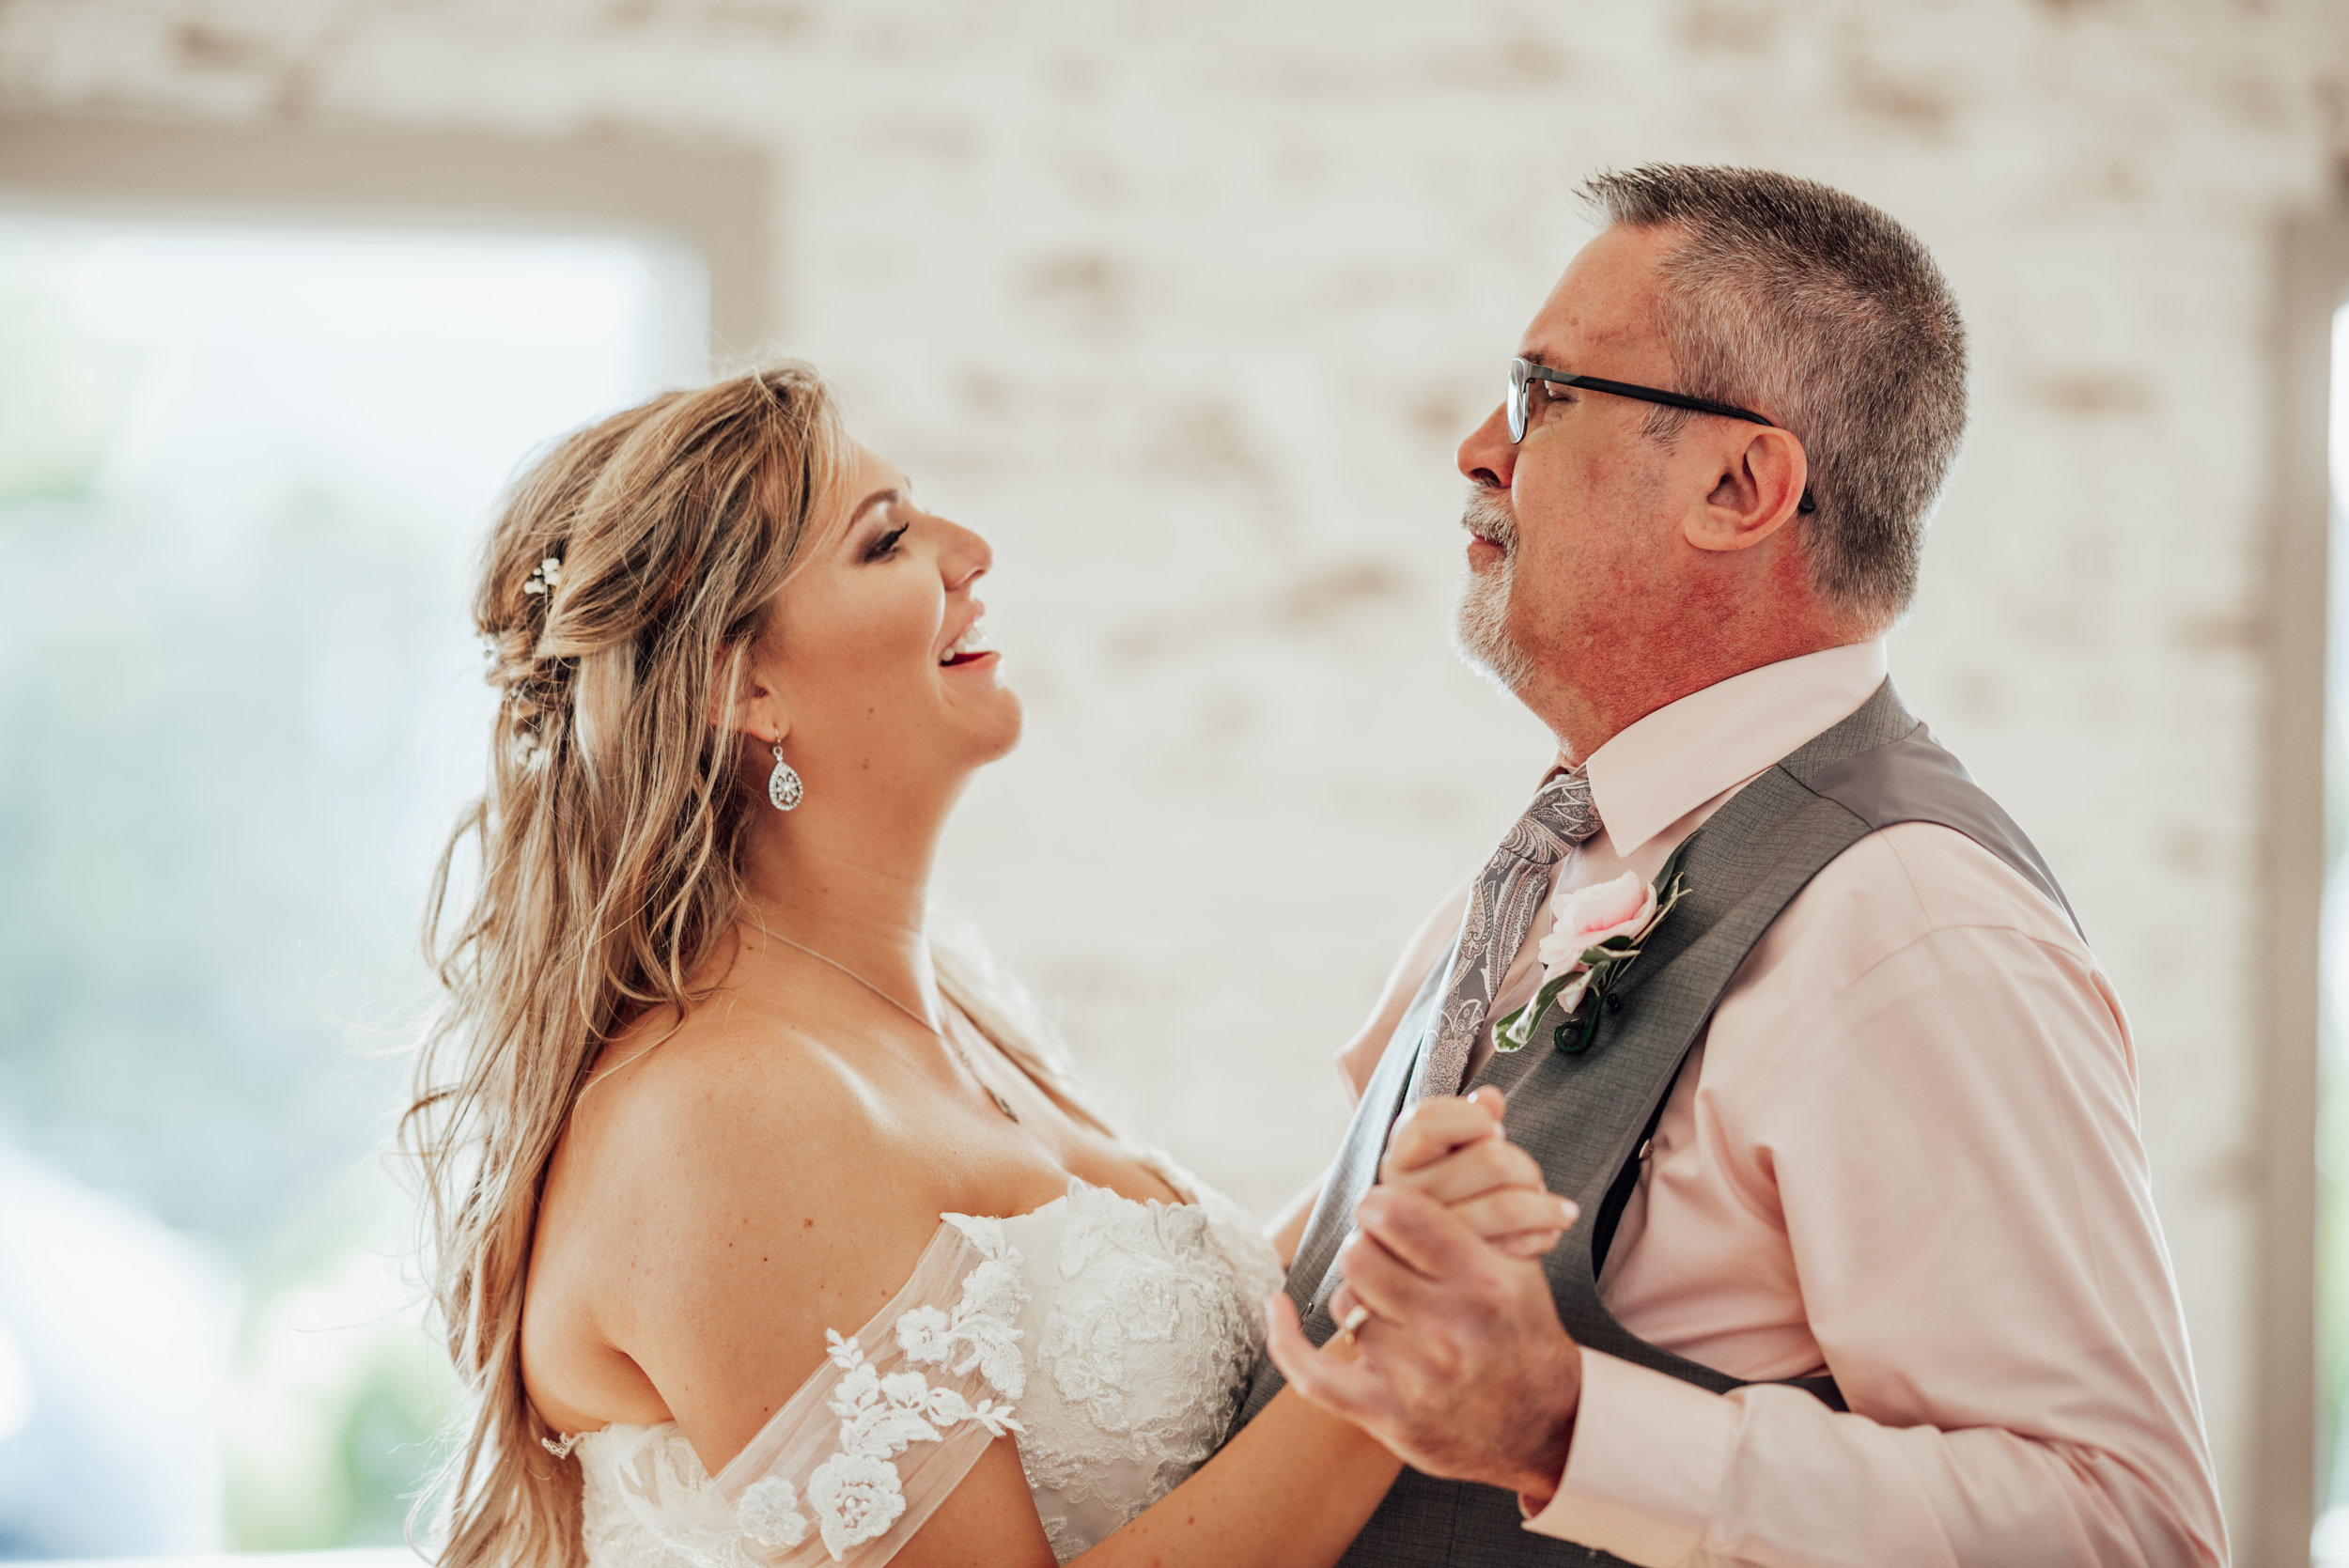 New Jersey Wedding Photographer, Felsberg Photography LBI wedding photography 94.jpg